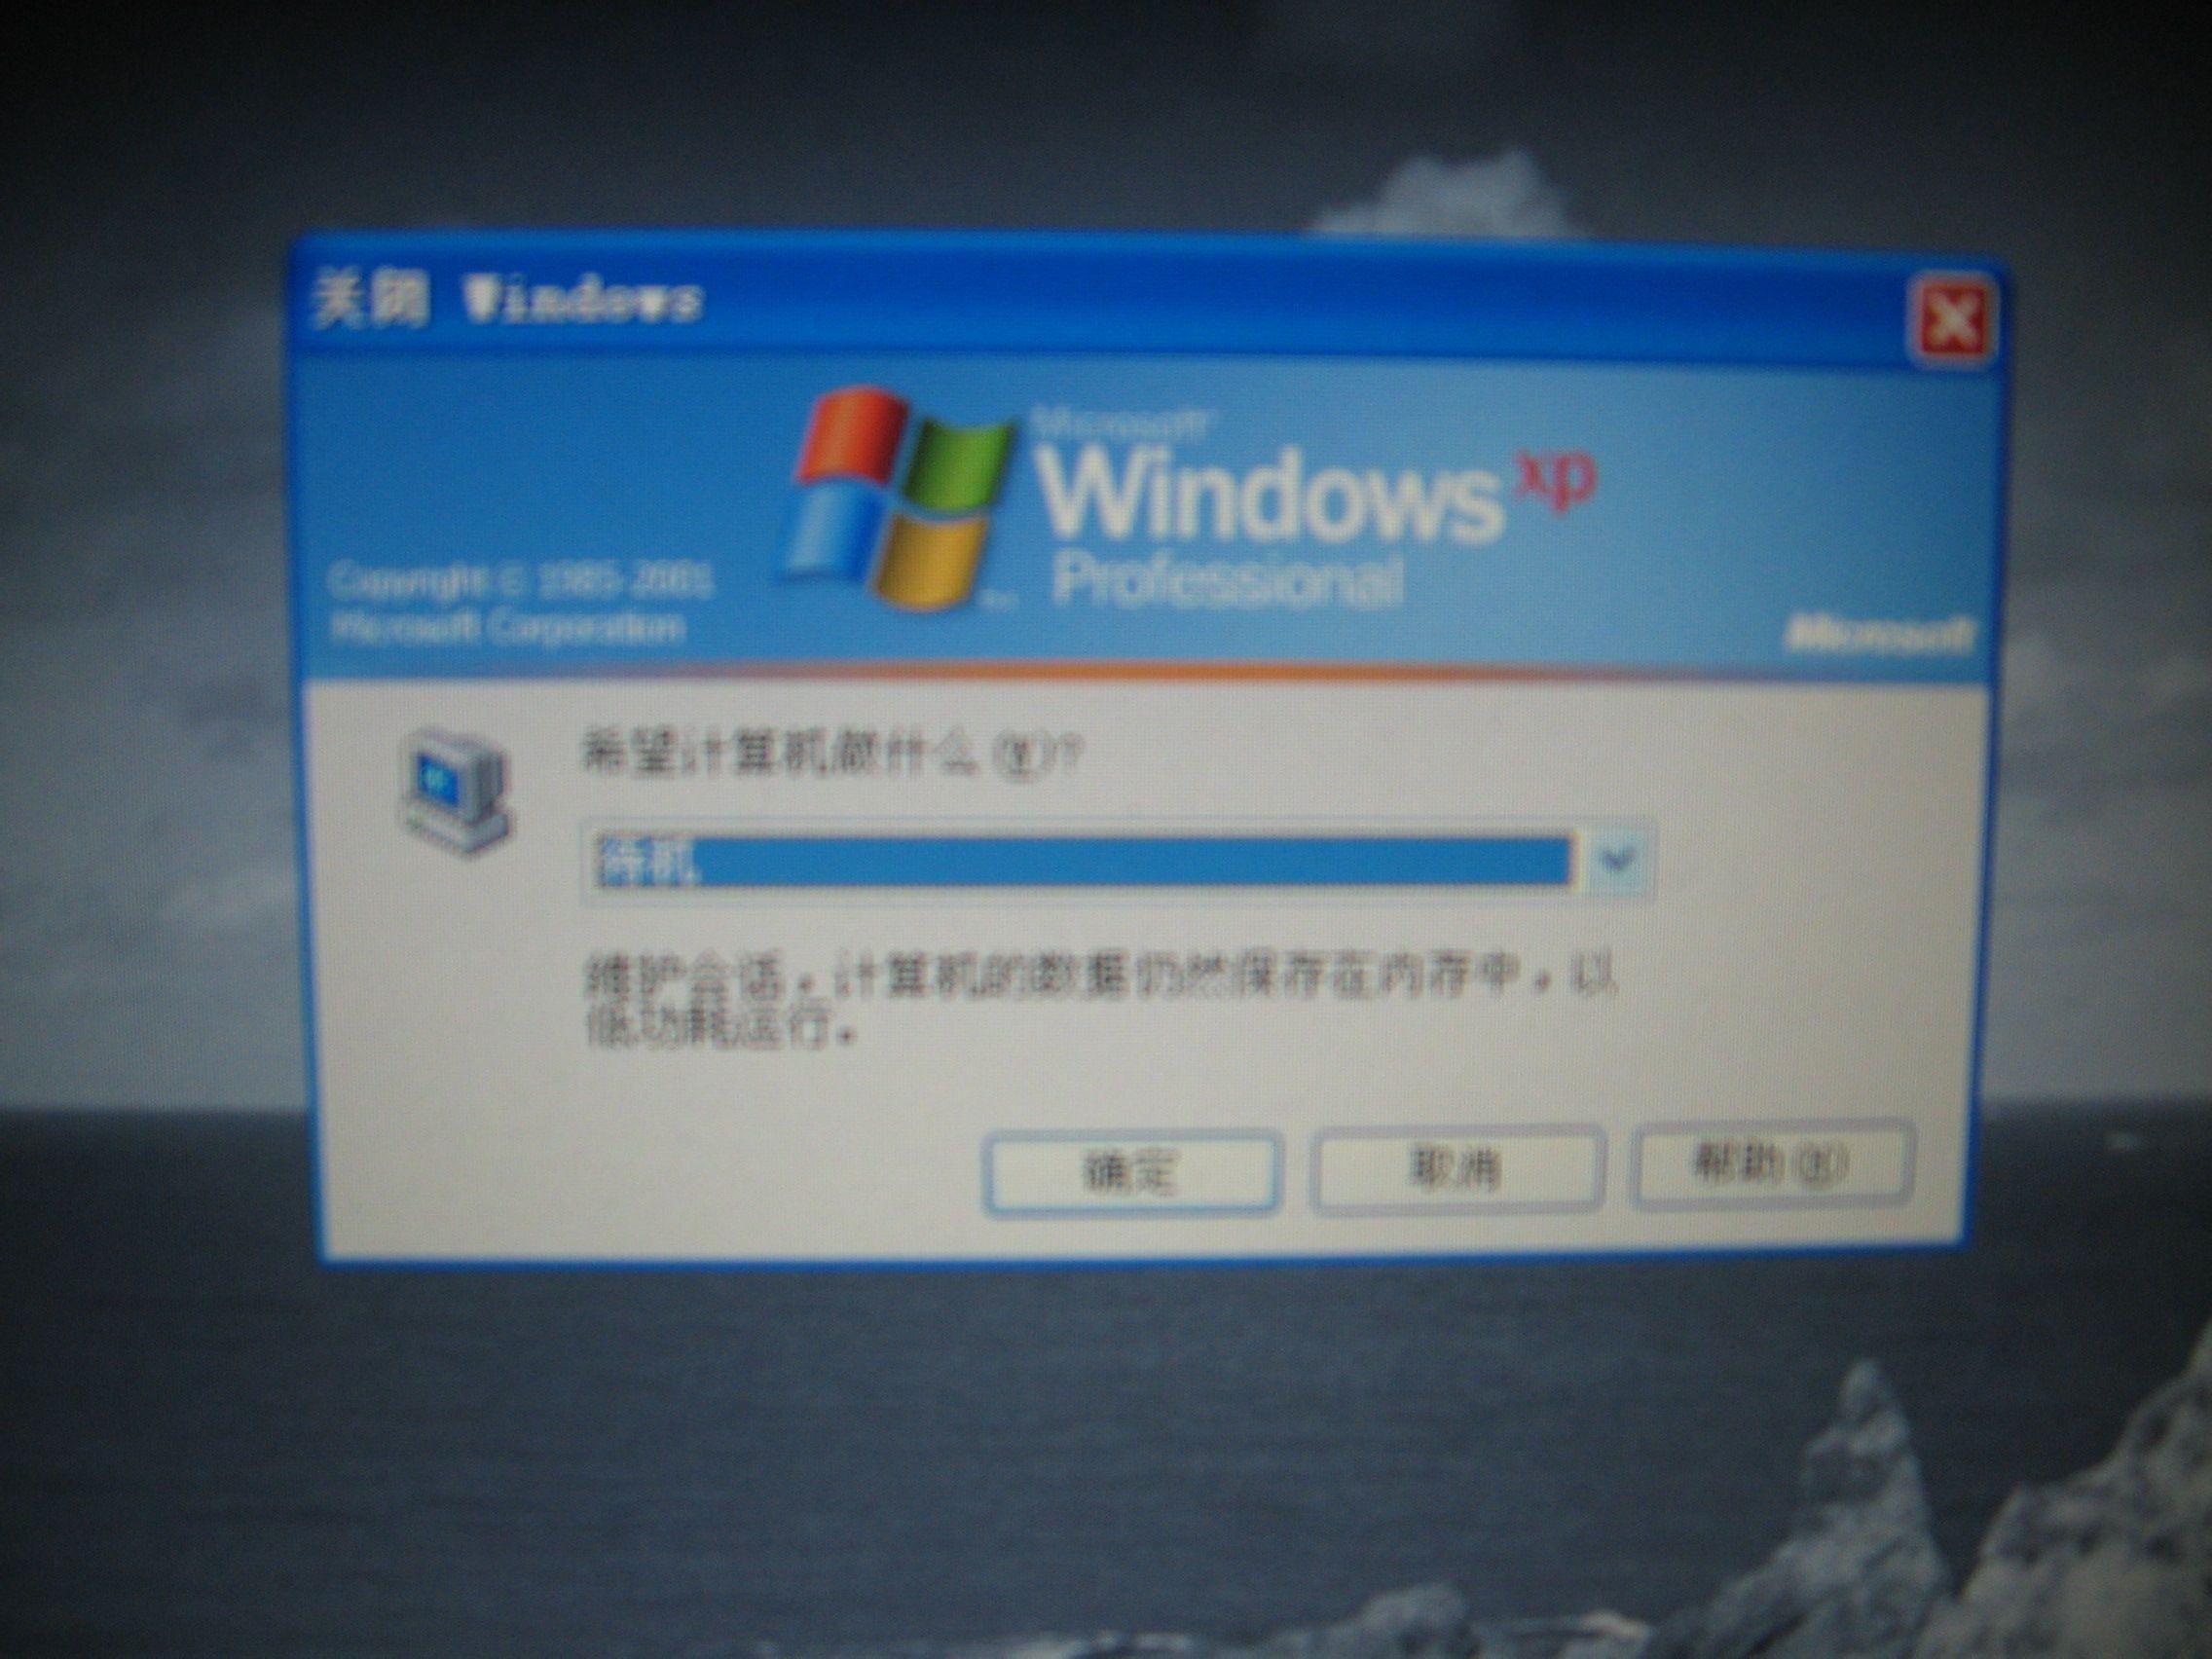 xp系统关机的时候程序无响应,要返回windows并检查程序状态,这是怎么